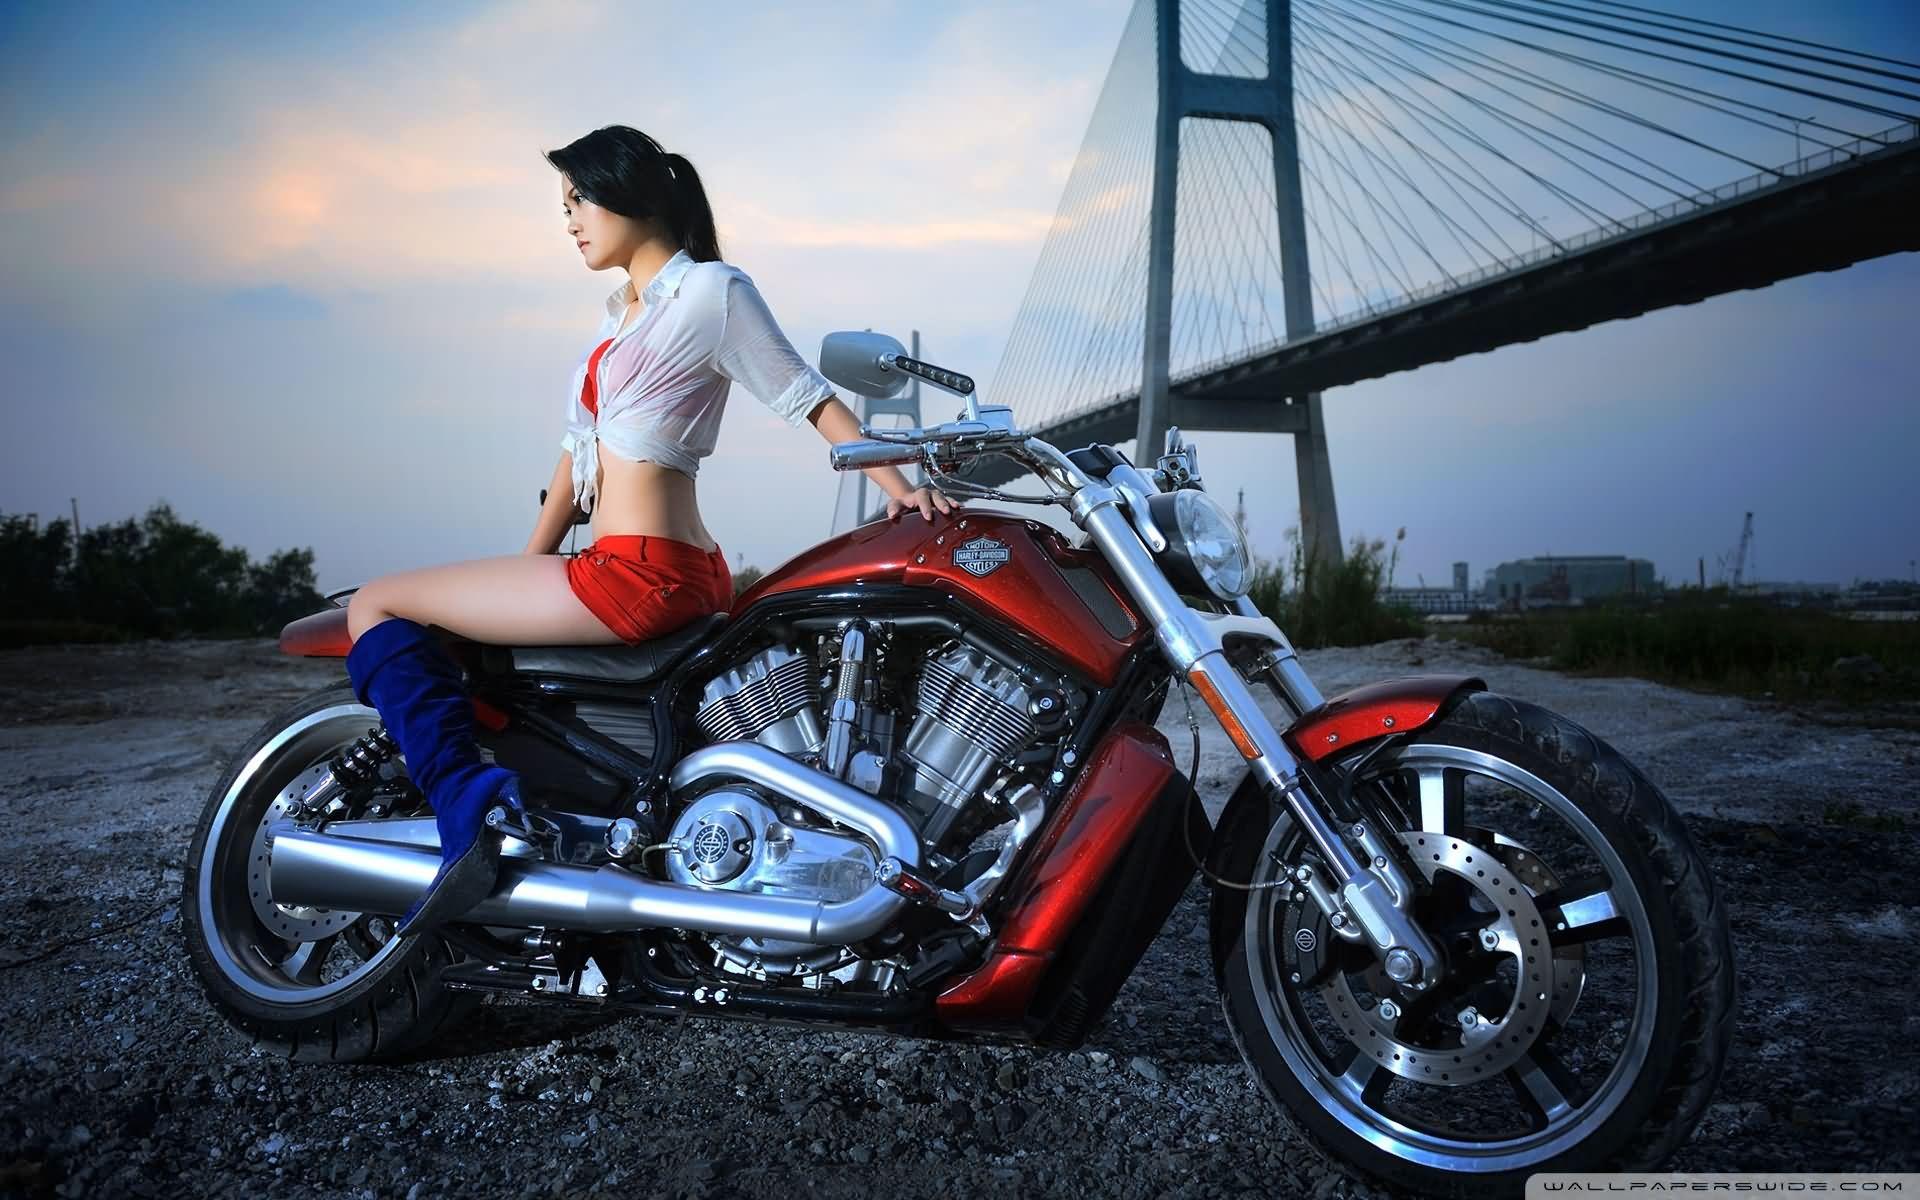 Stylish Girl With Harley Davidson Bike Image Harley Davidson